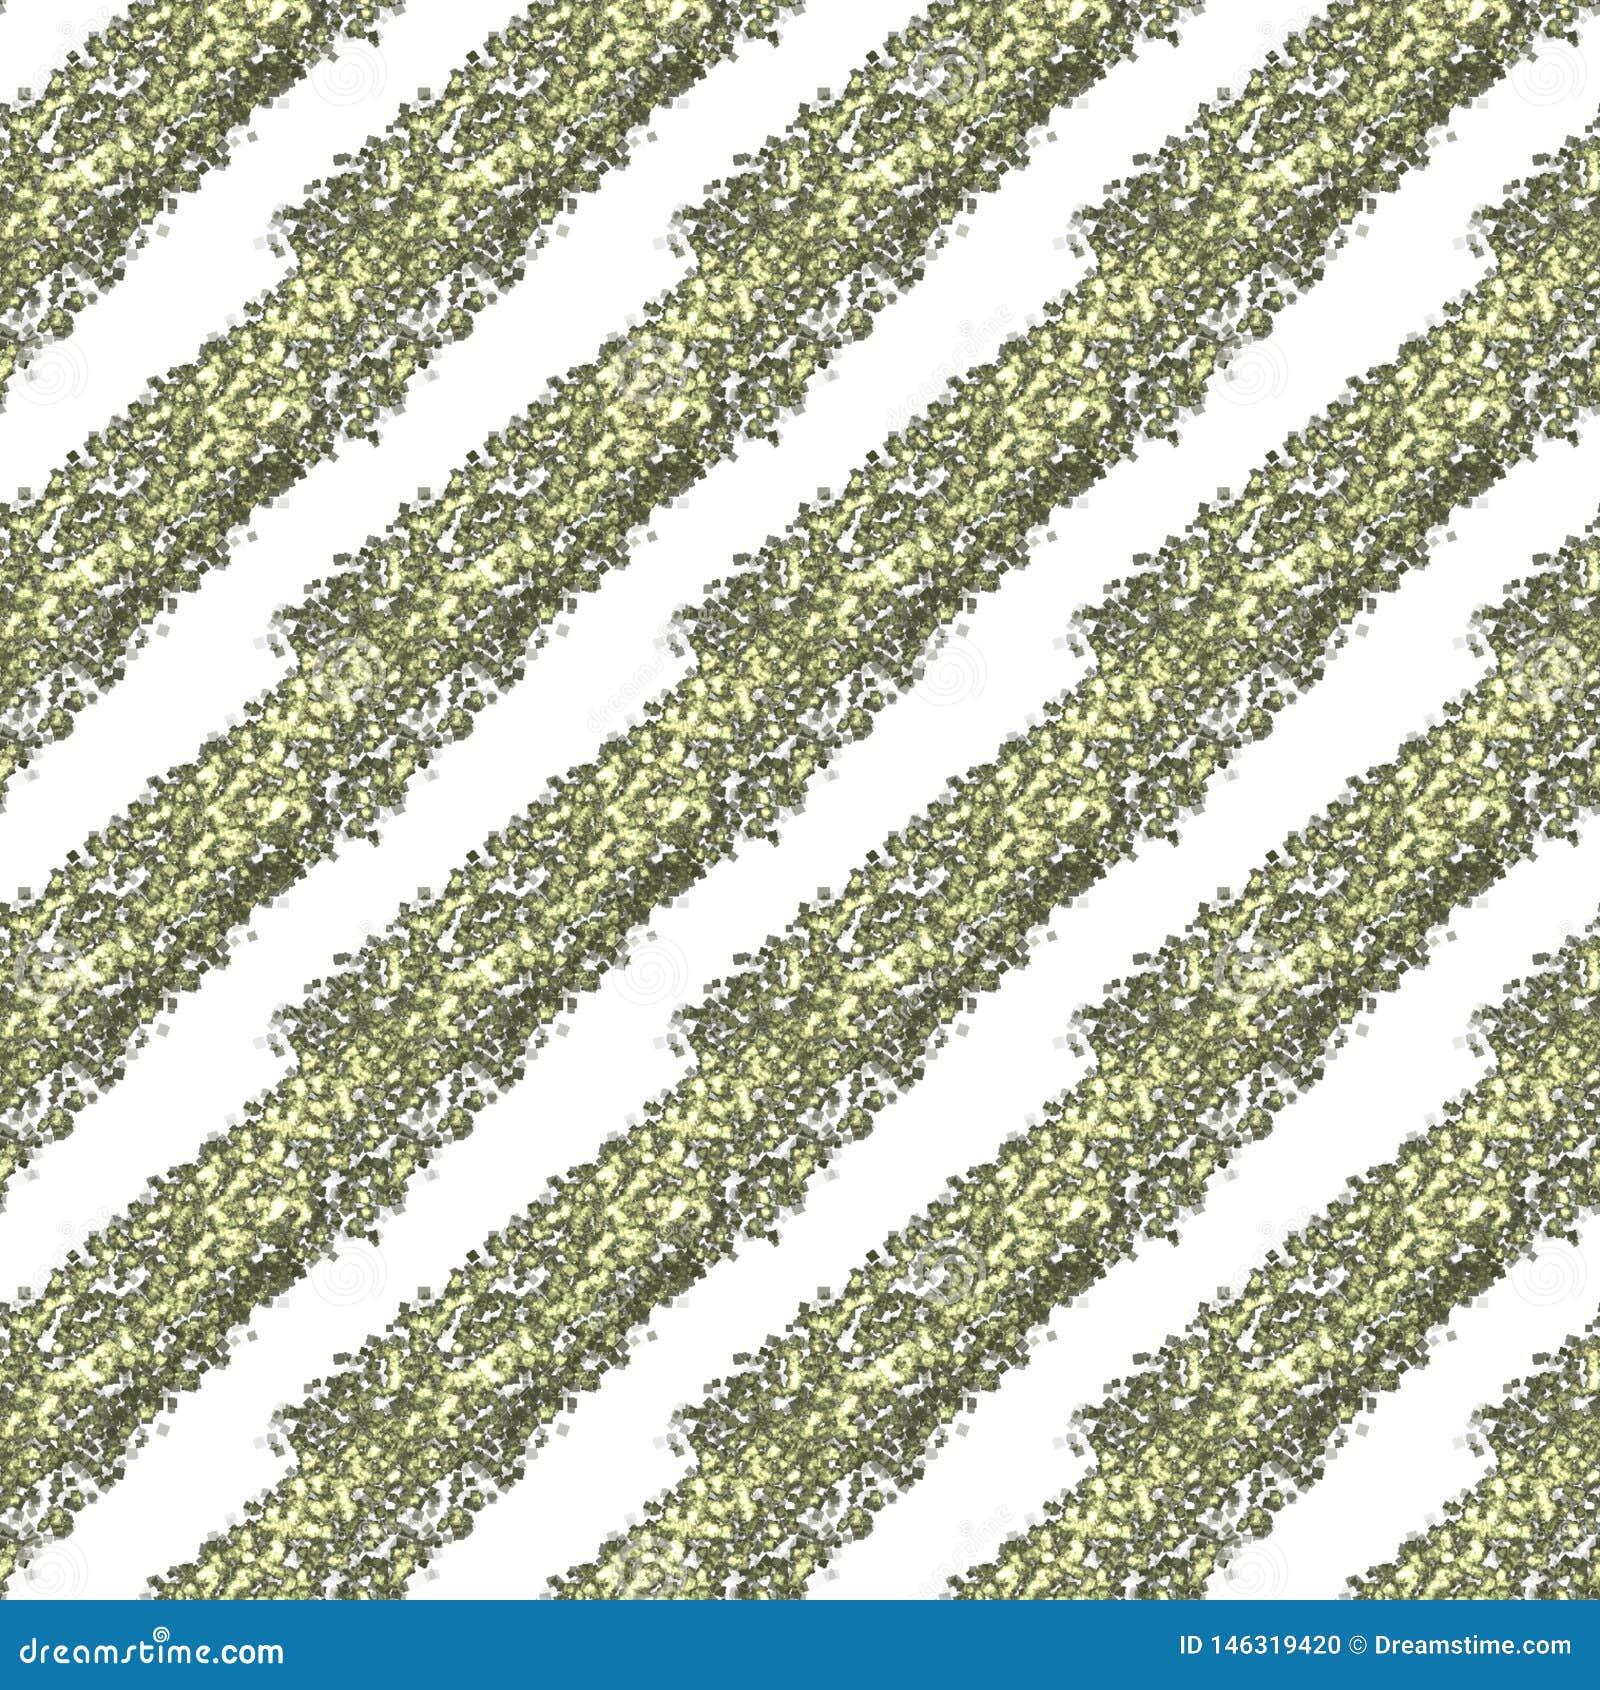 Guld bl?nker diagonala band p? en vit bakgrund, s?ml?s ?ndl?s modell